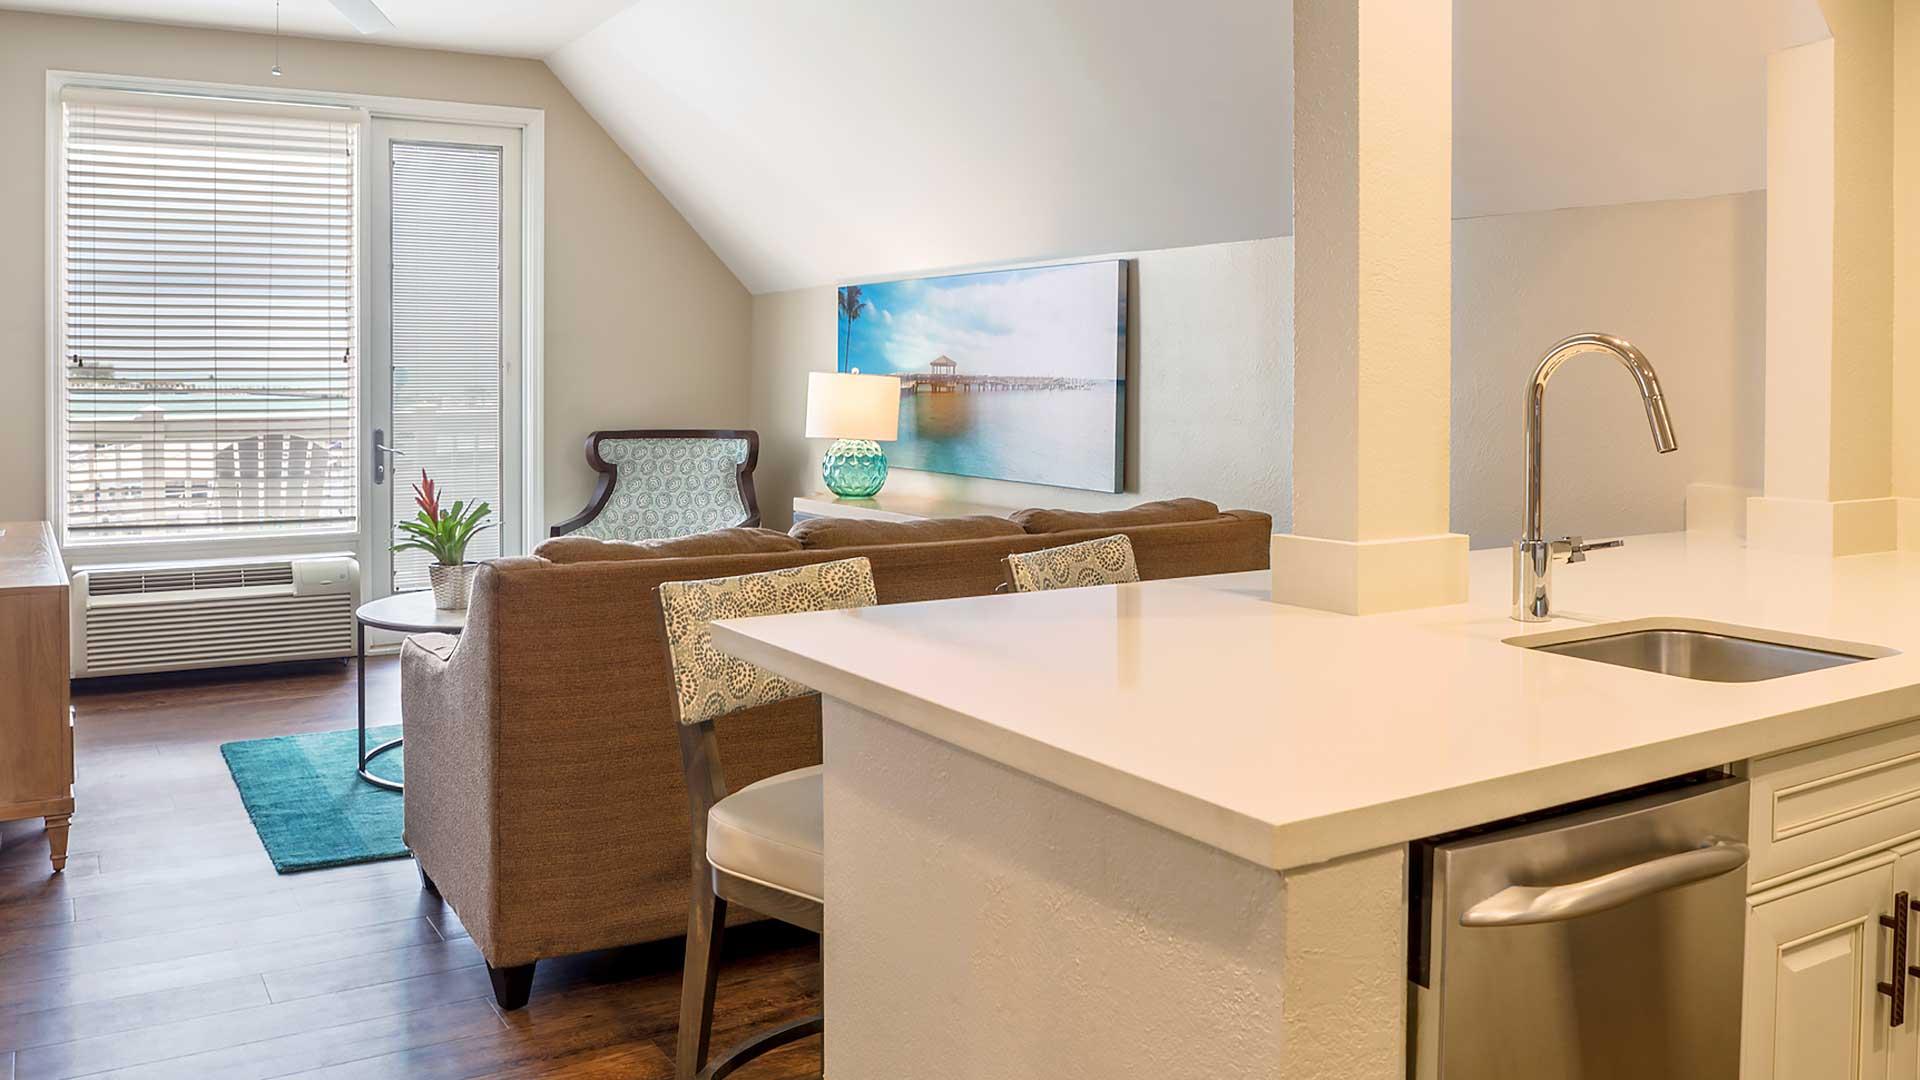 One Bedroom Suites in Key West at Margaritaville Resort